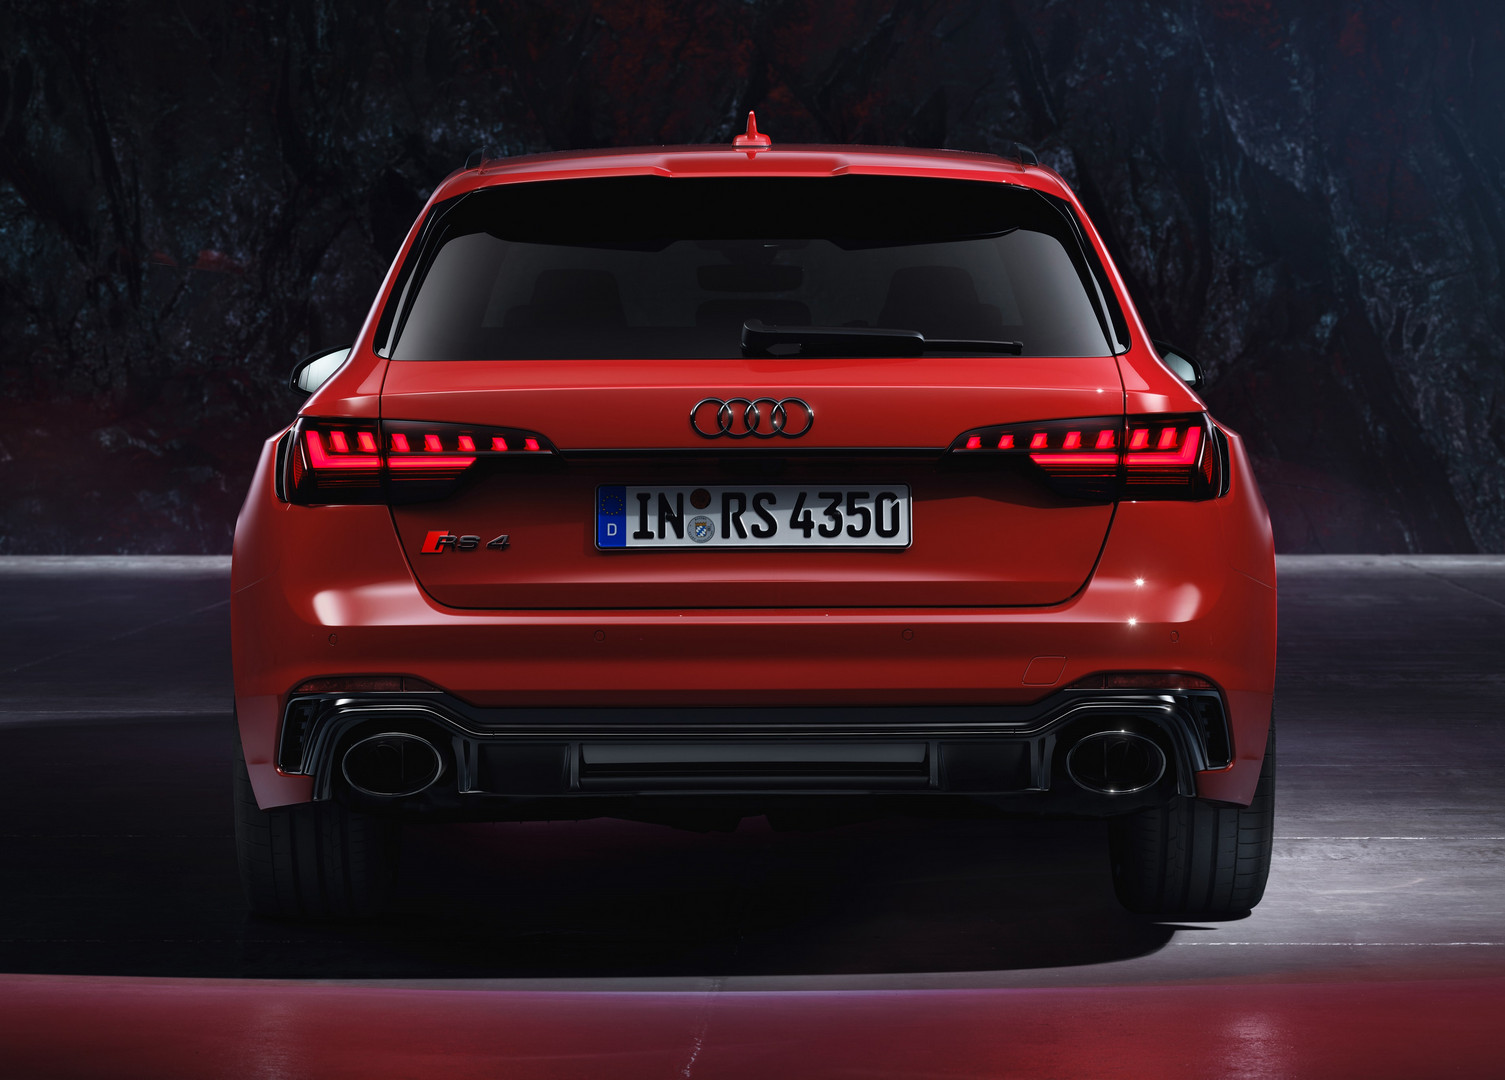 Audi RS4 Avant Rear View